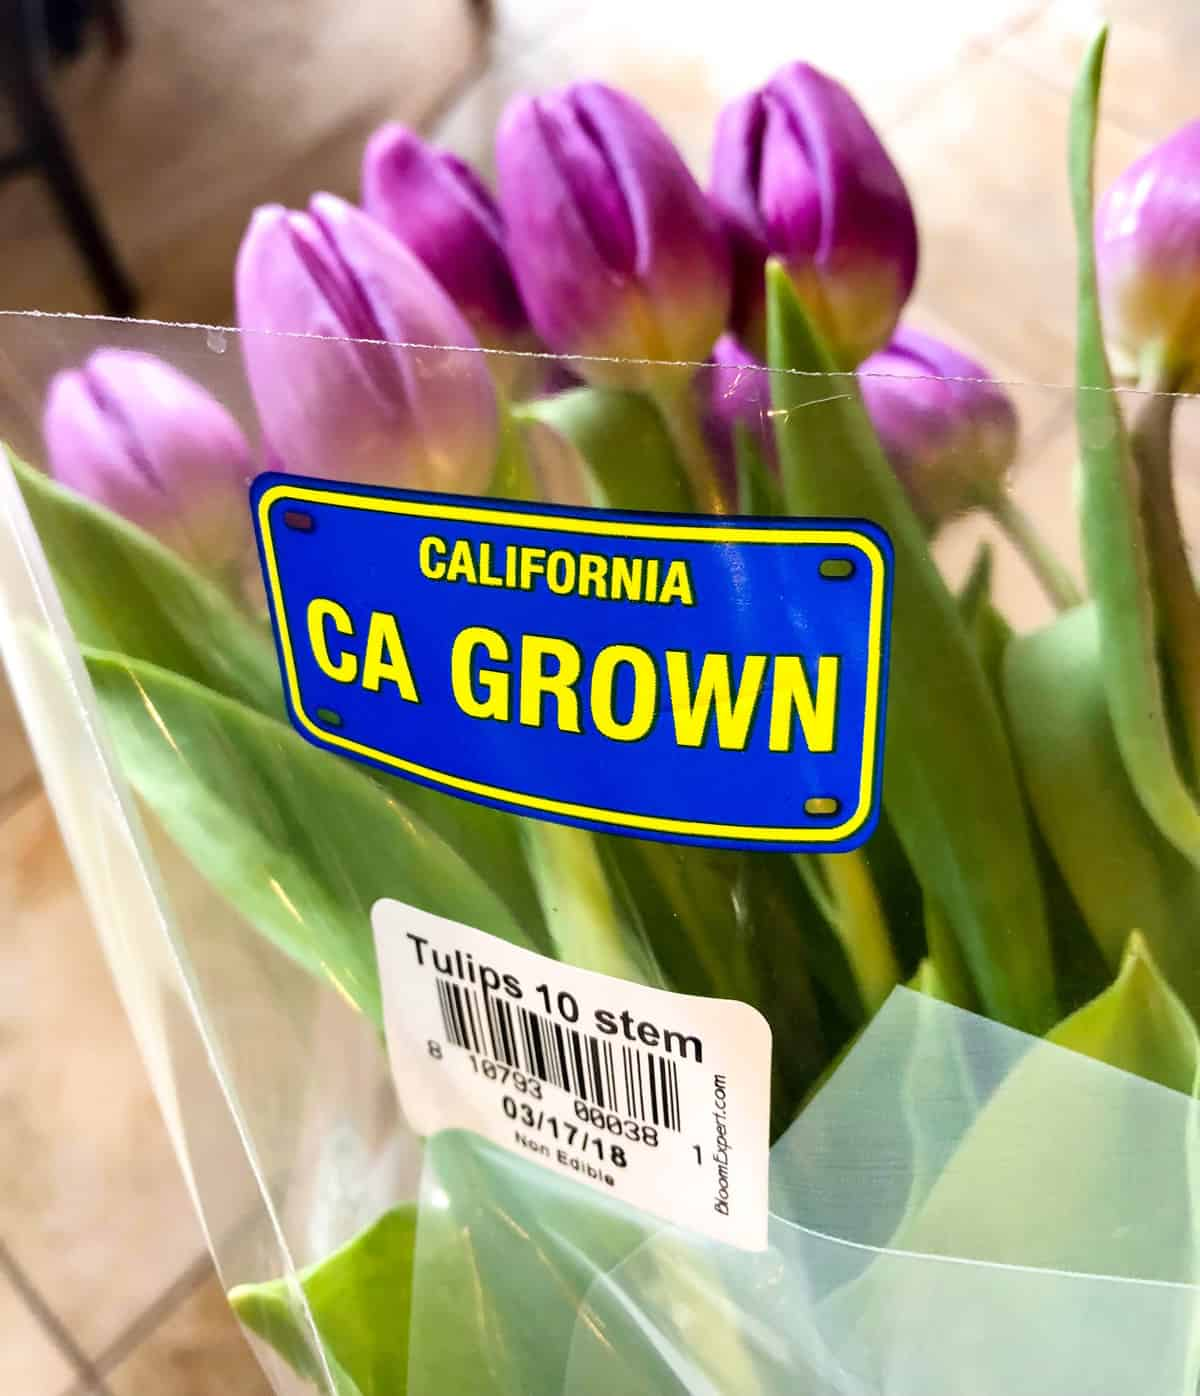 California Grown Tulips